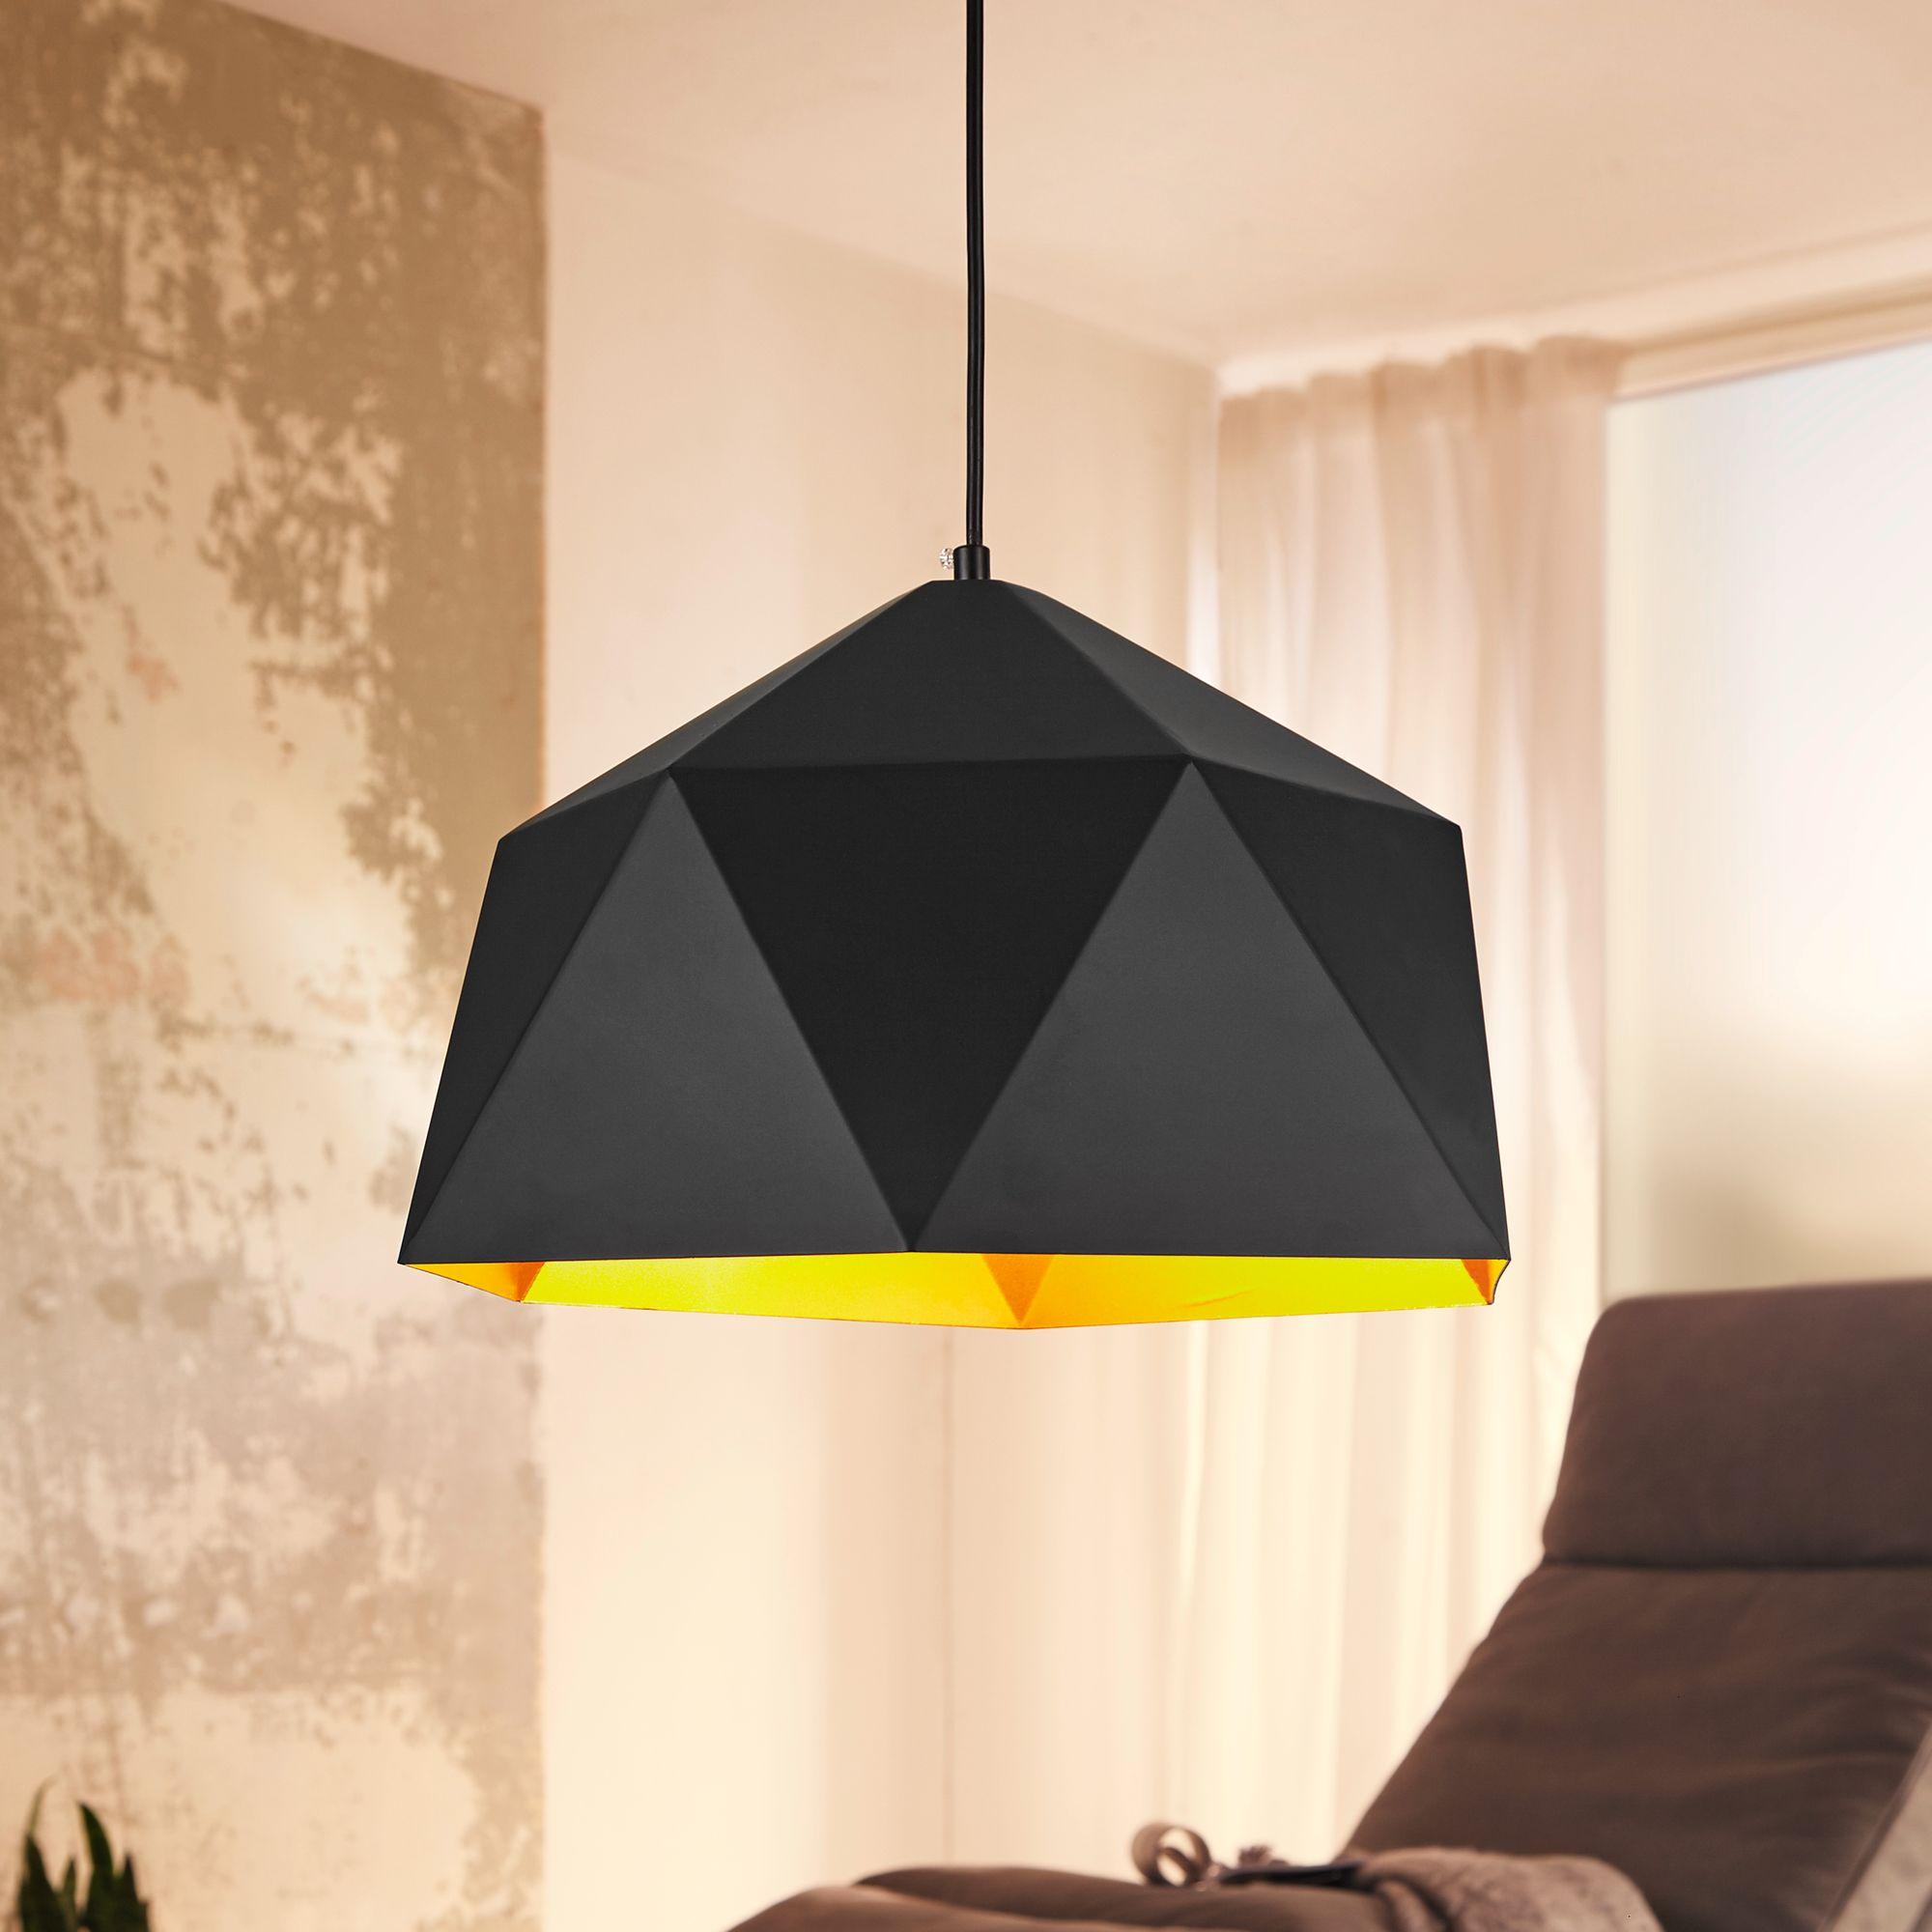 finebuy design h ngelampe hexa 38cm schwarz gold deckenlampe mit metall schirm moderne. Black Bedroom Furniture Sets. Home Design Ideas